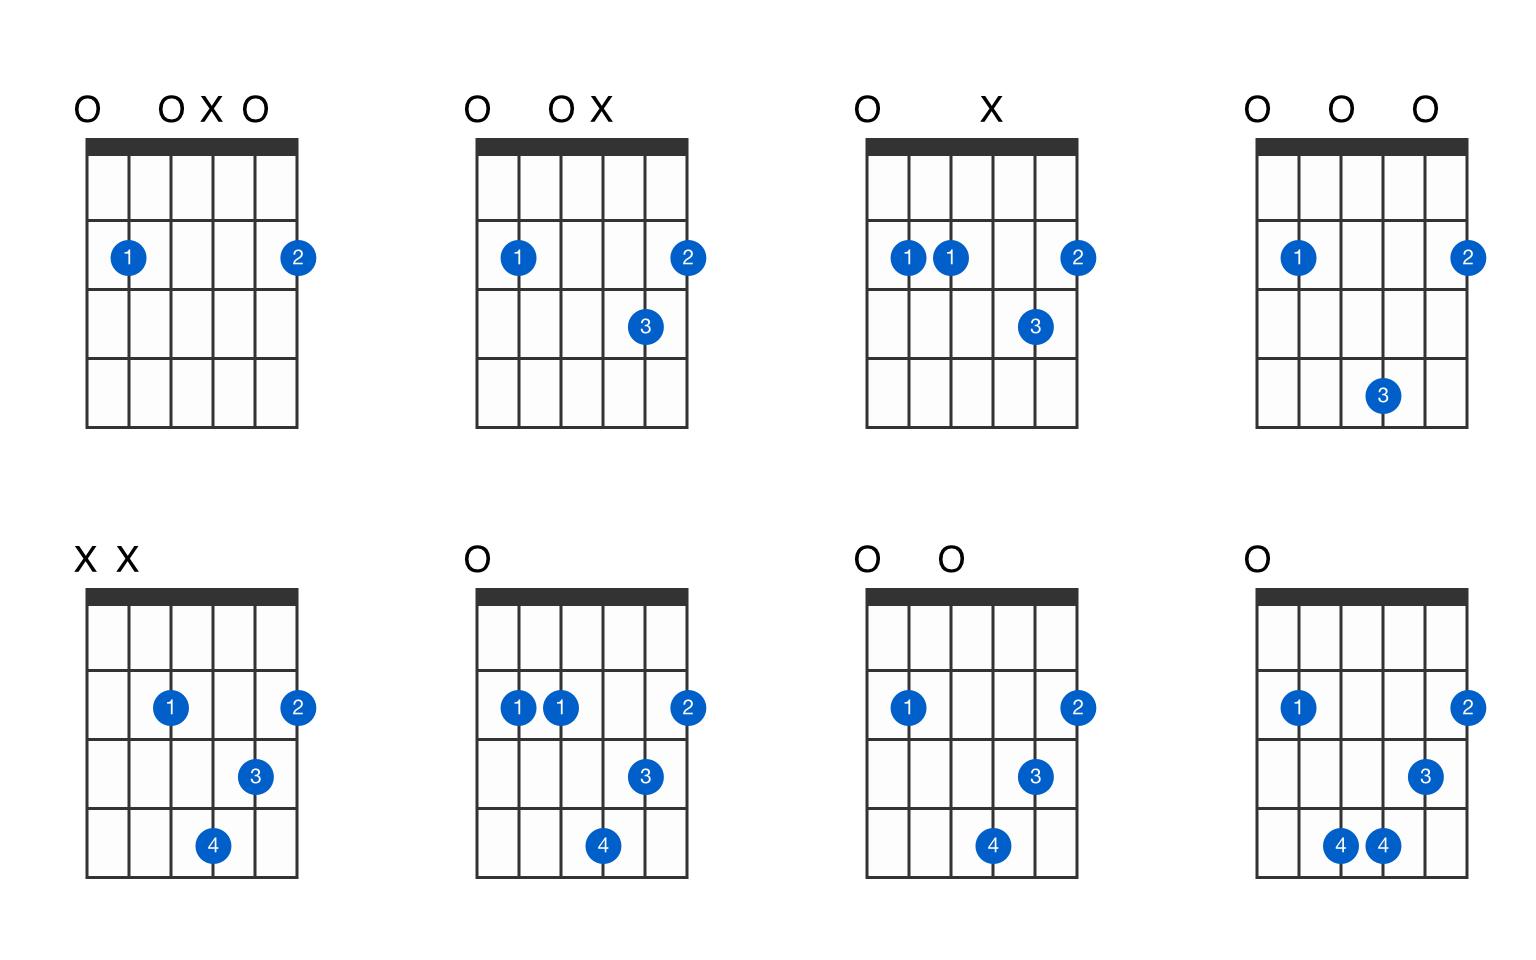 E dominant 15th suspended 15nd guitar chord   GtrLib Chords